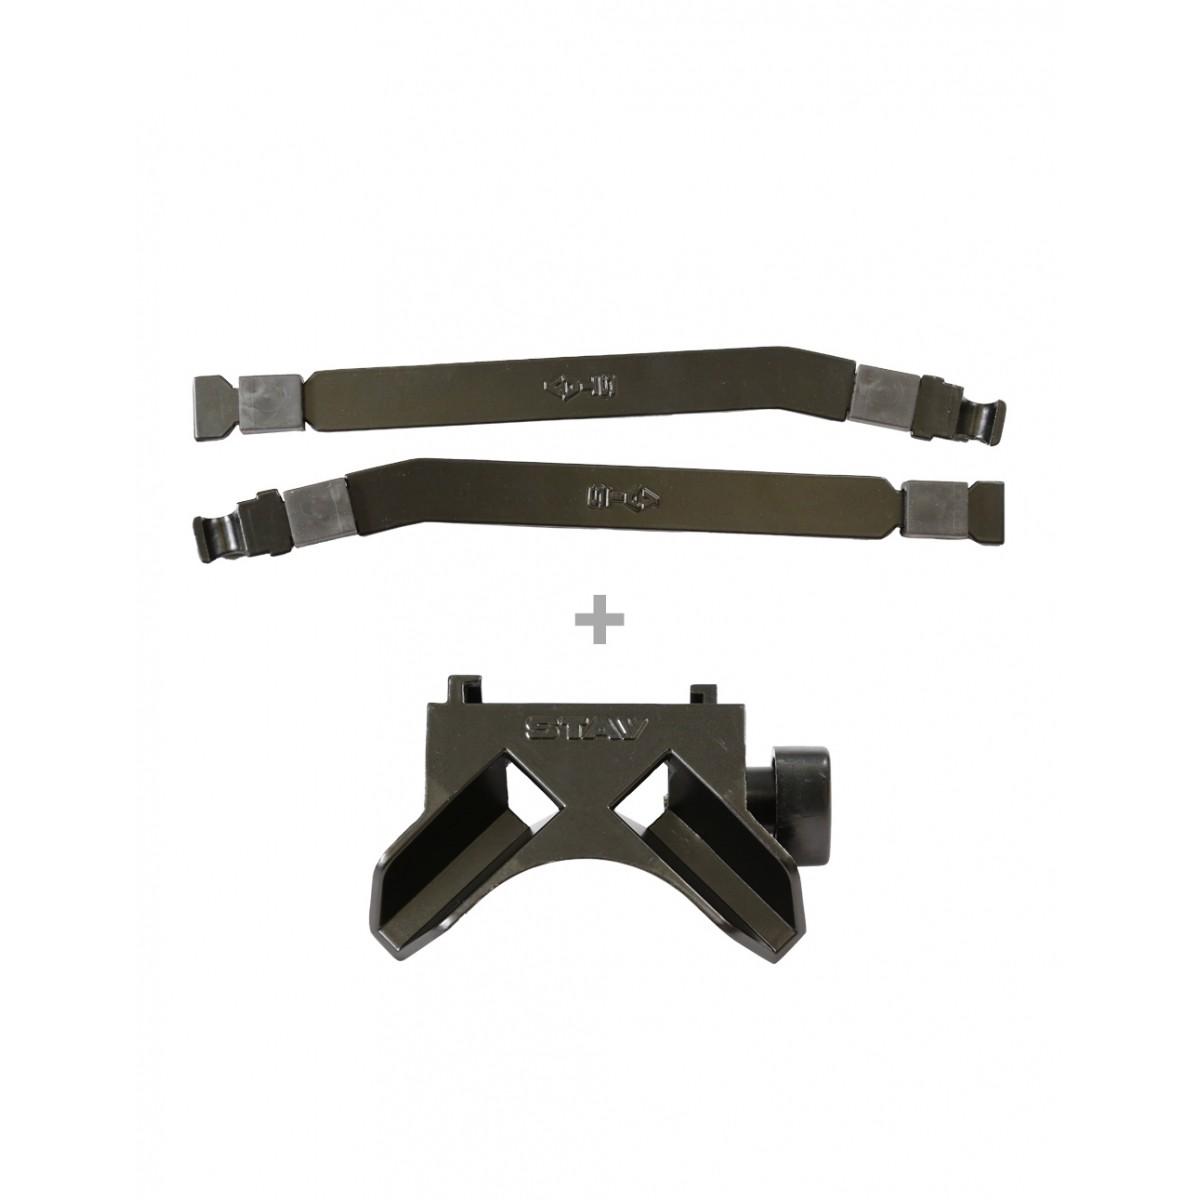 Kit Braços Curvos p/ Slim ou Compact (longarinas) 29cm + Base Reta Slim / Compact